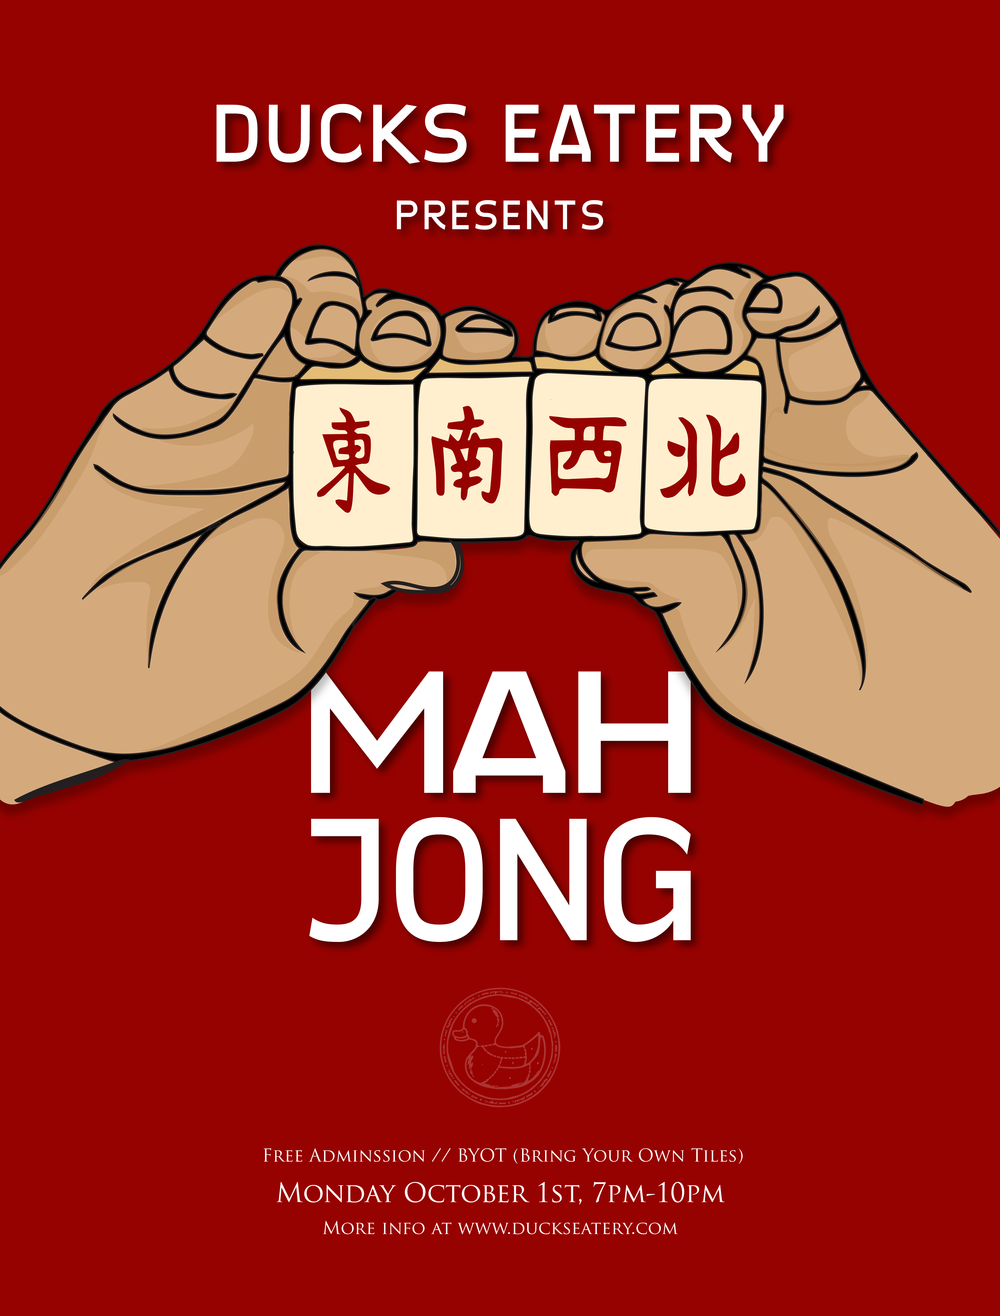 ducks mahjong poster 5-01.png